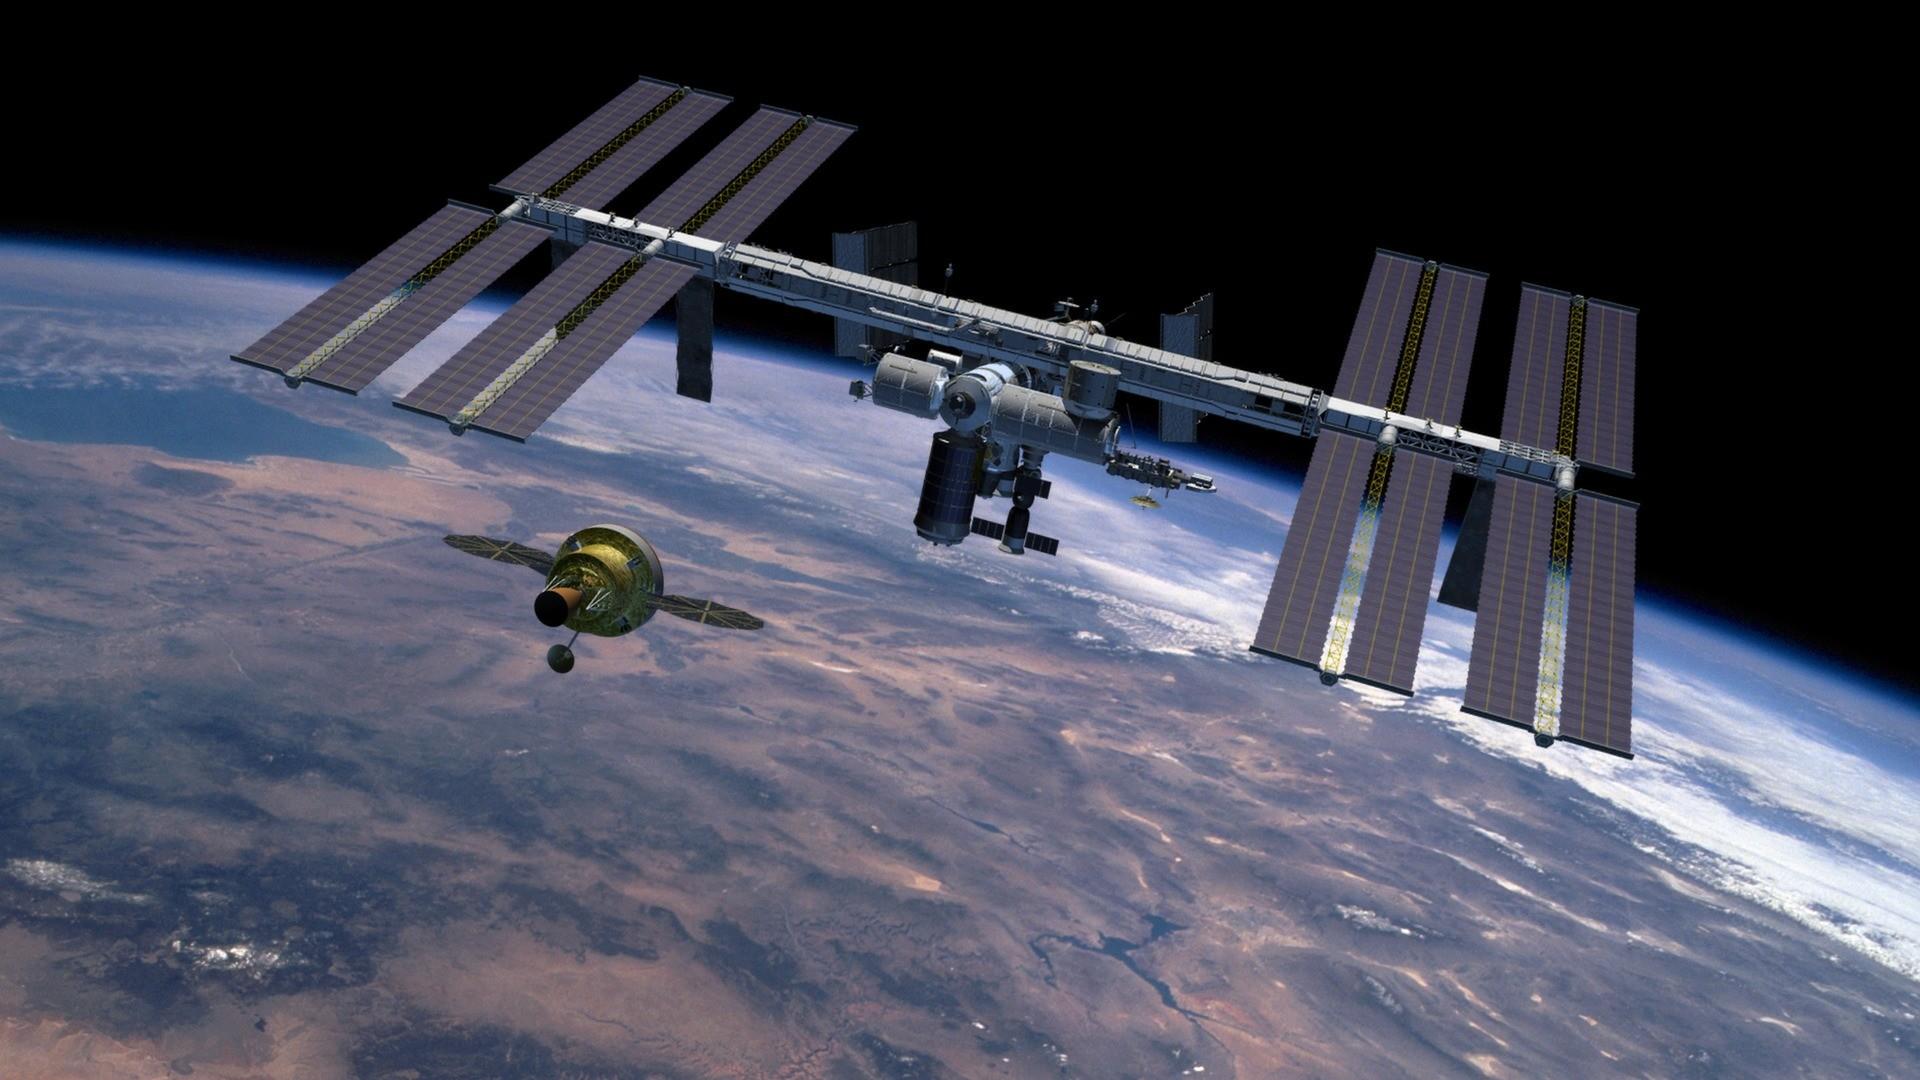 Nasa Orion Crew Exploration Vehicle. international space station …